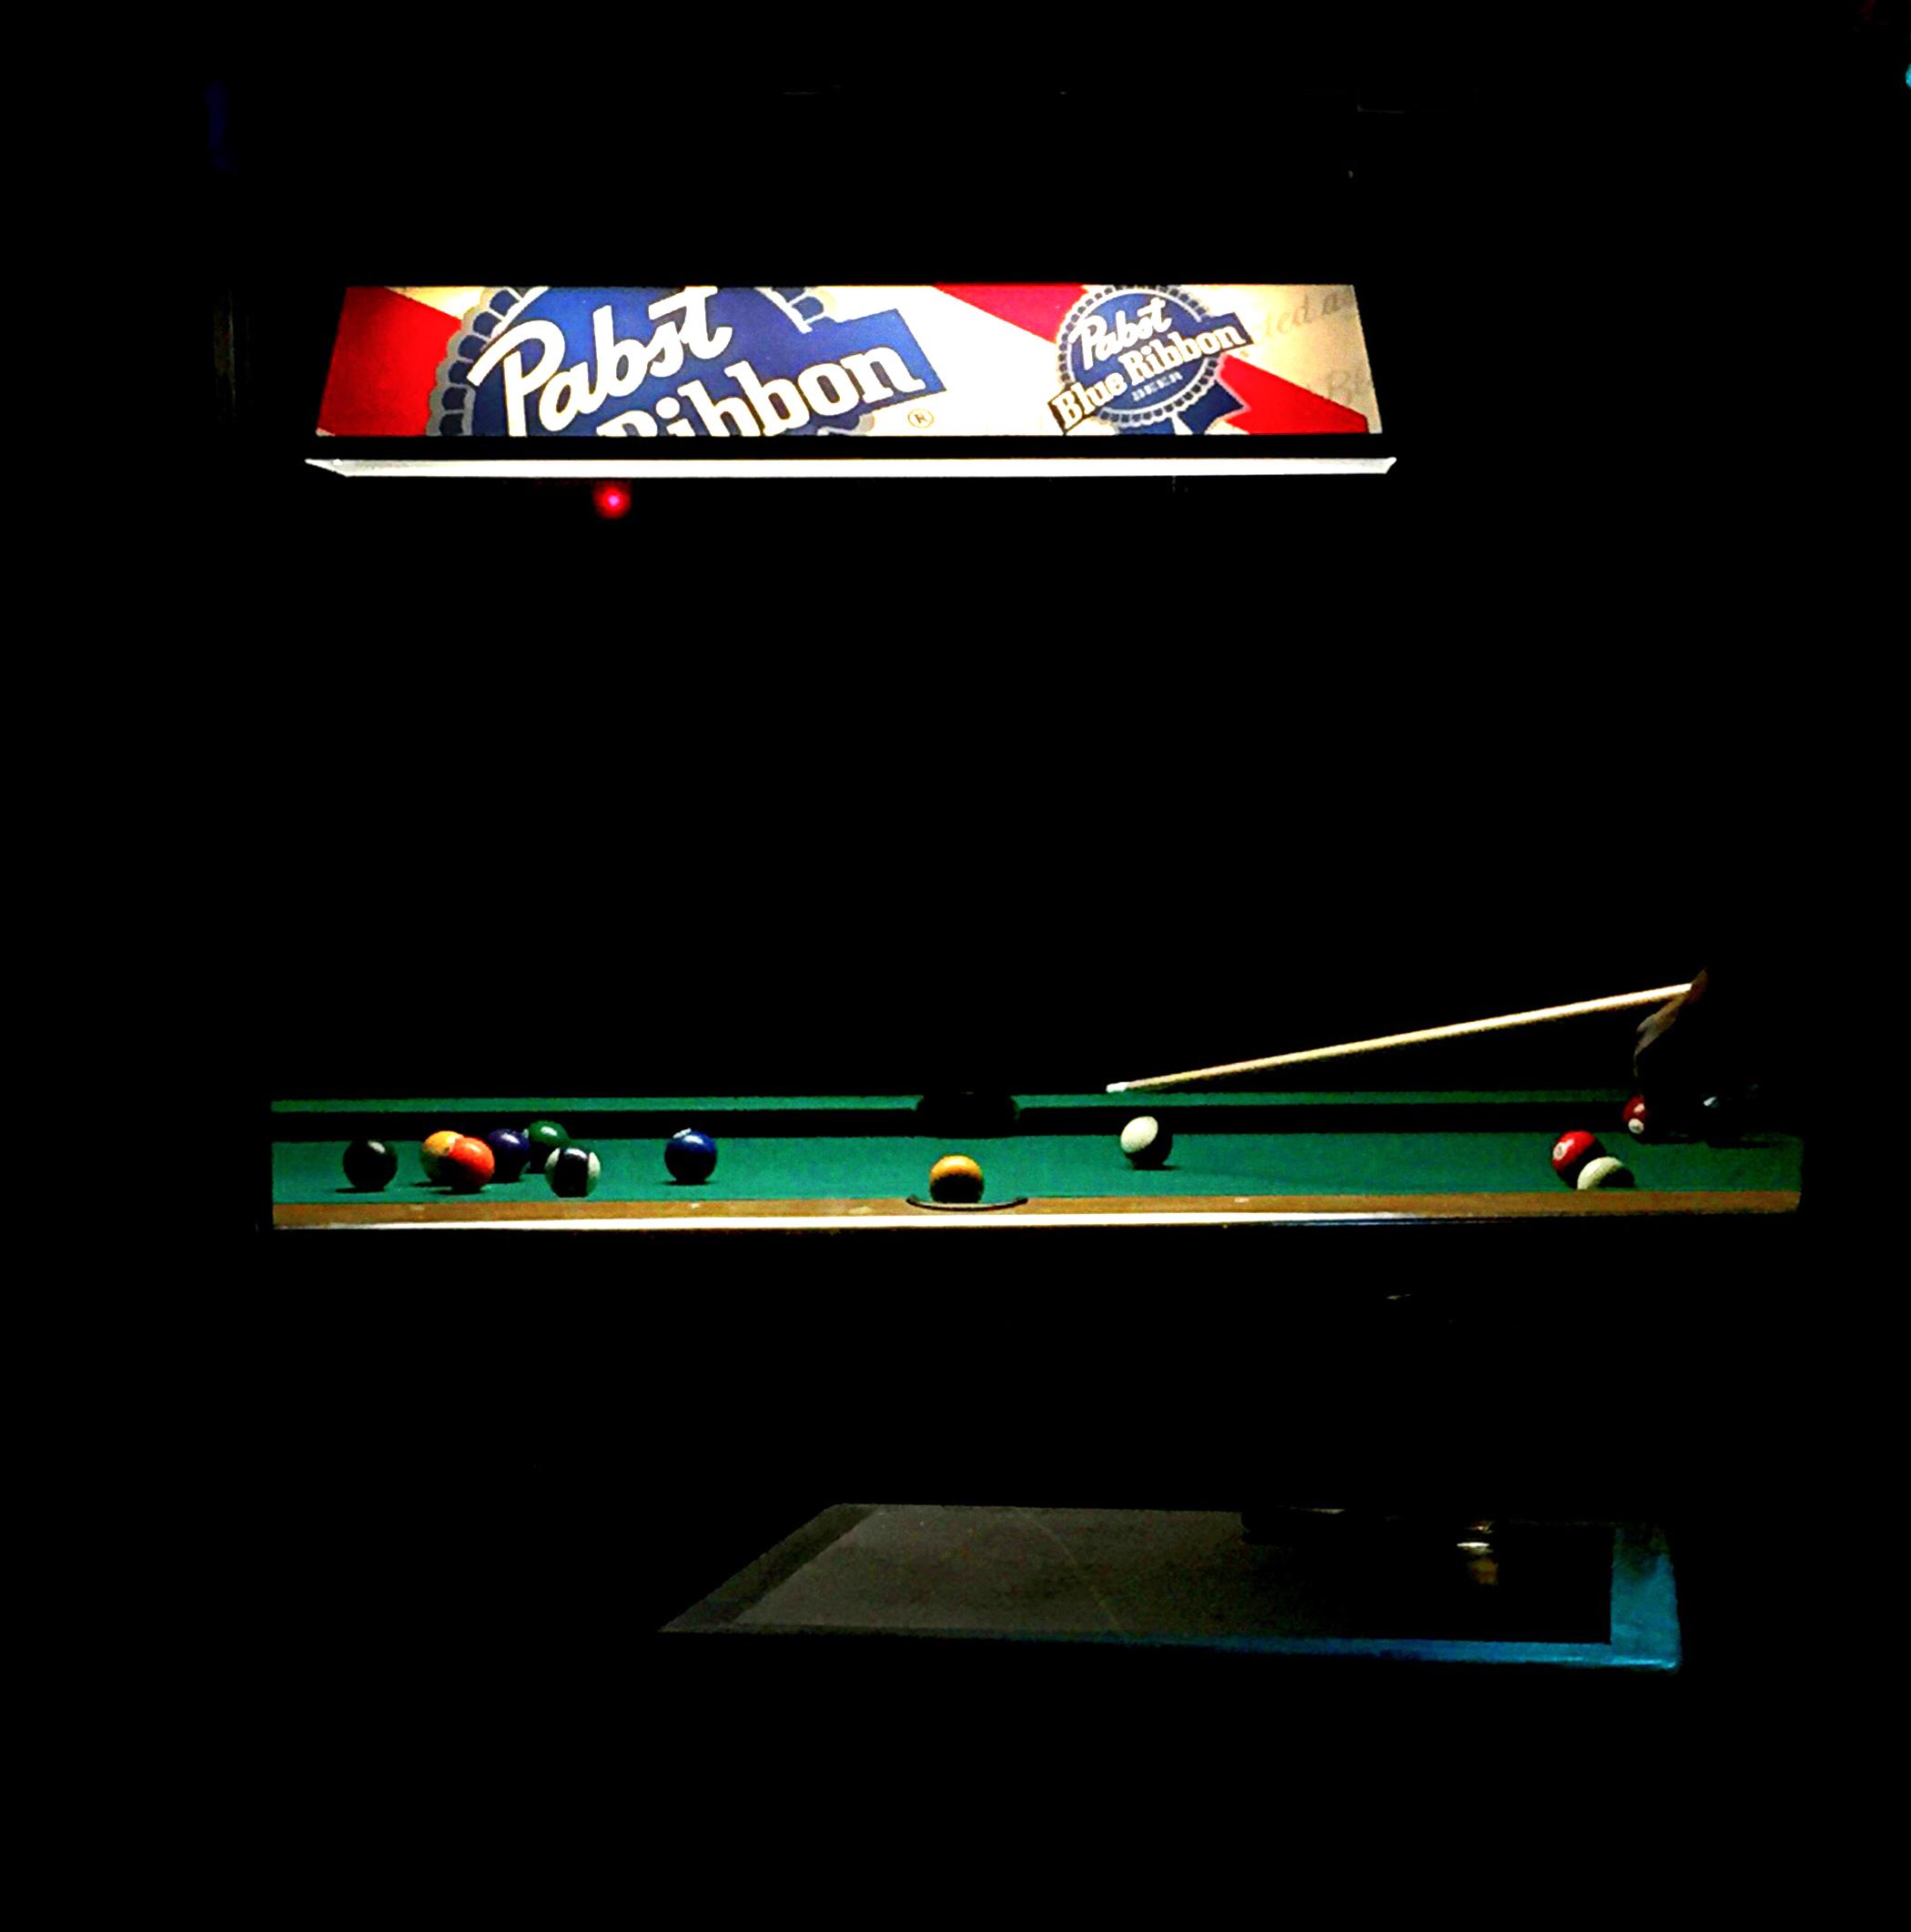 Pool Parlor